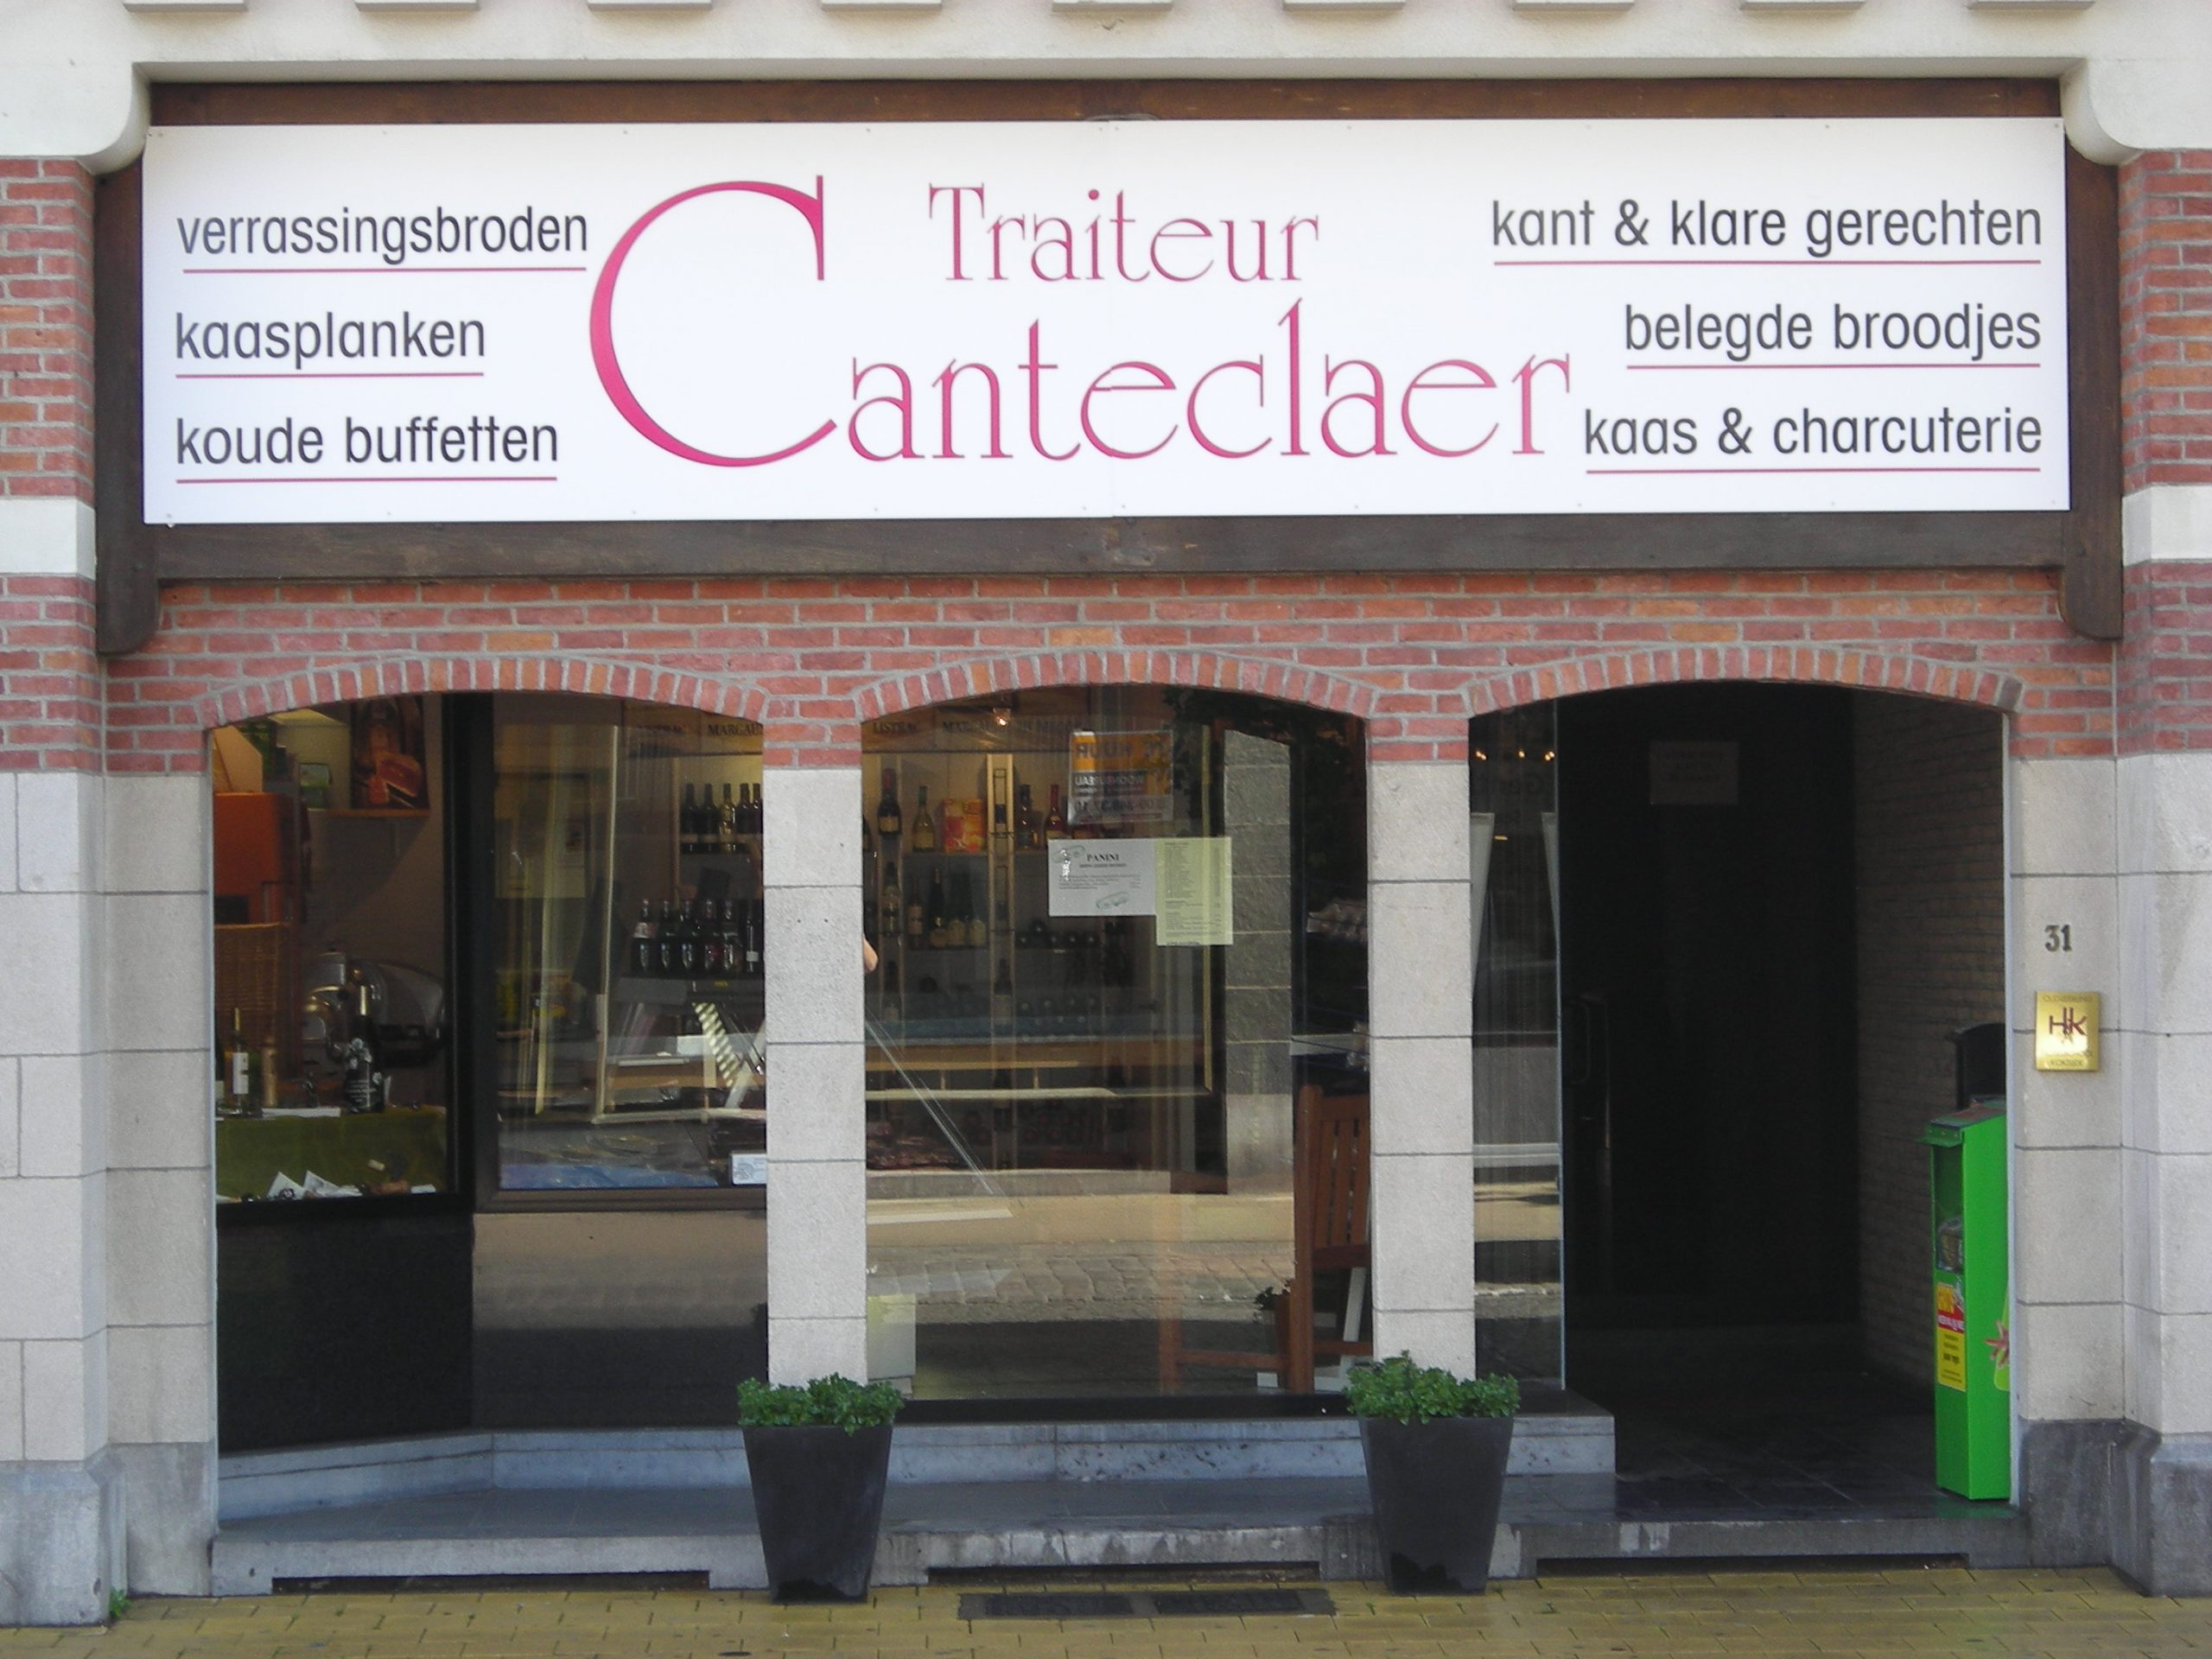 Gevel_Canteclaer